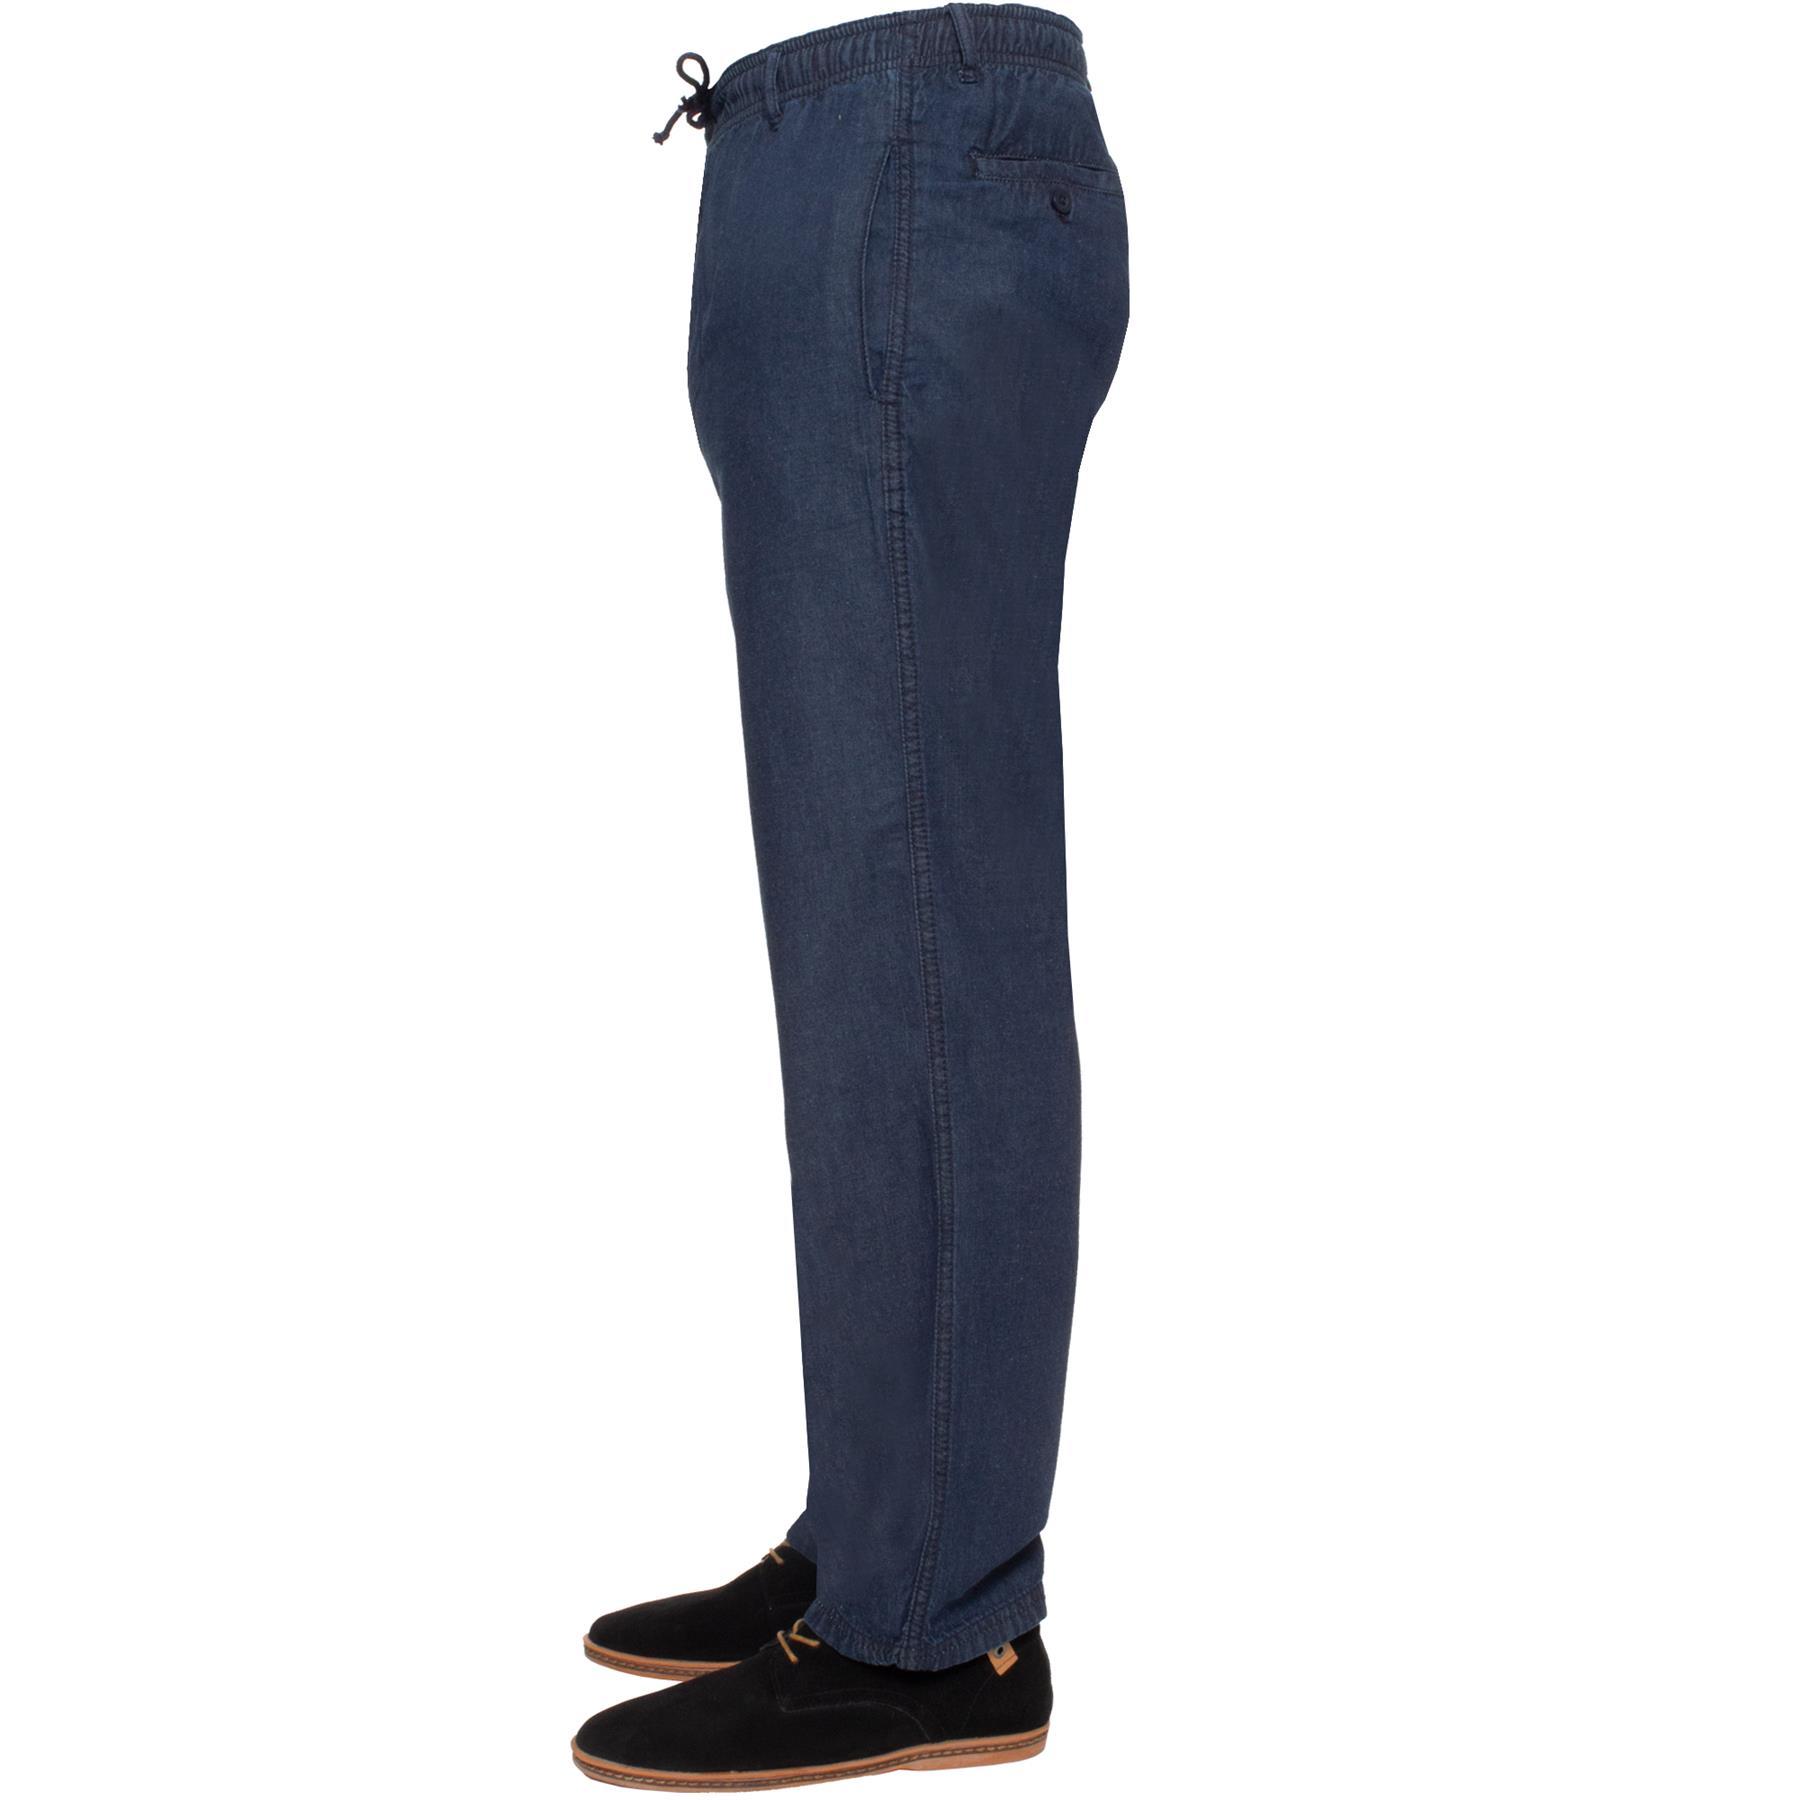 Para-Hombres-Pantalones-De-Rugby-Kruze-cintura-elastica-con-cordon-pantalones-REGULAR-King-Tamanos miniatura 20